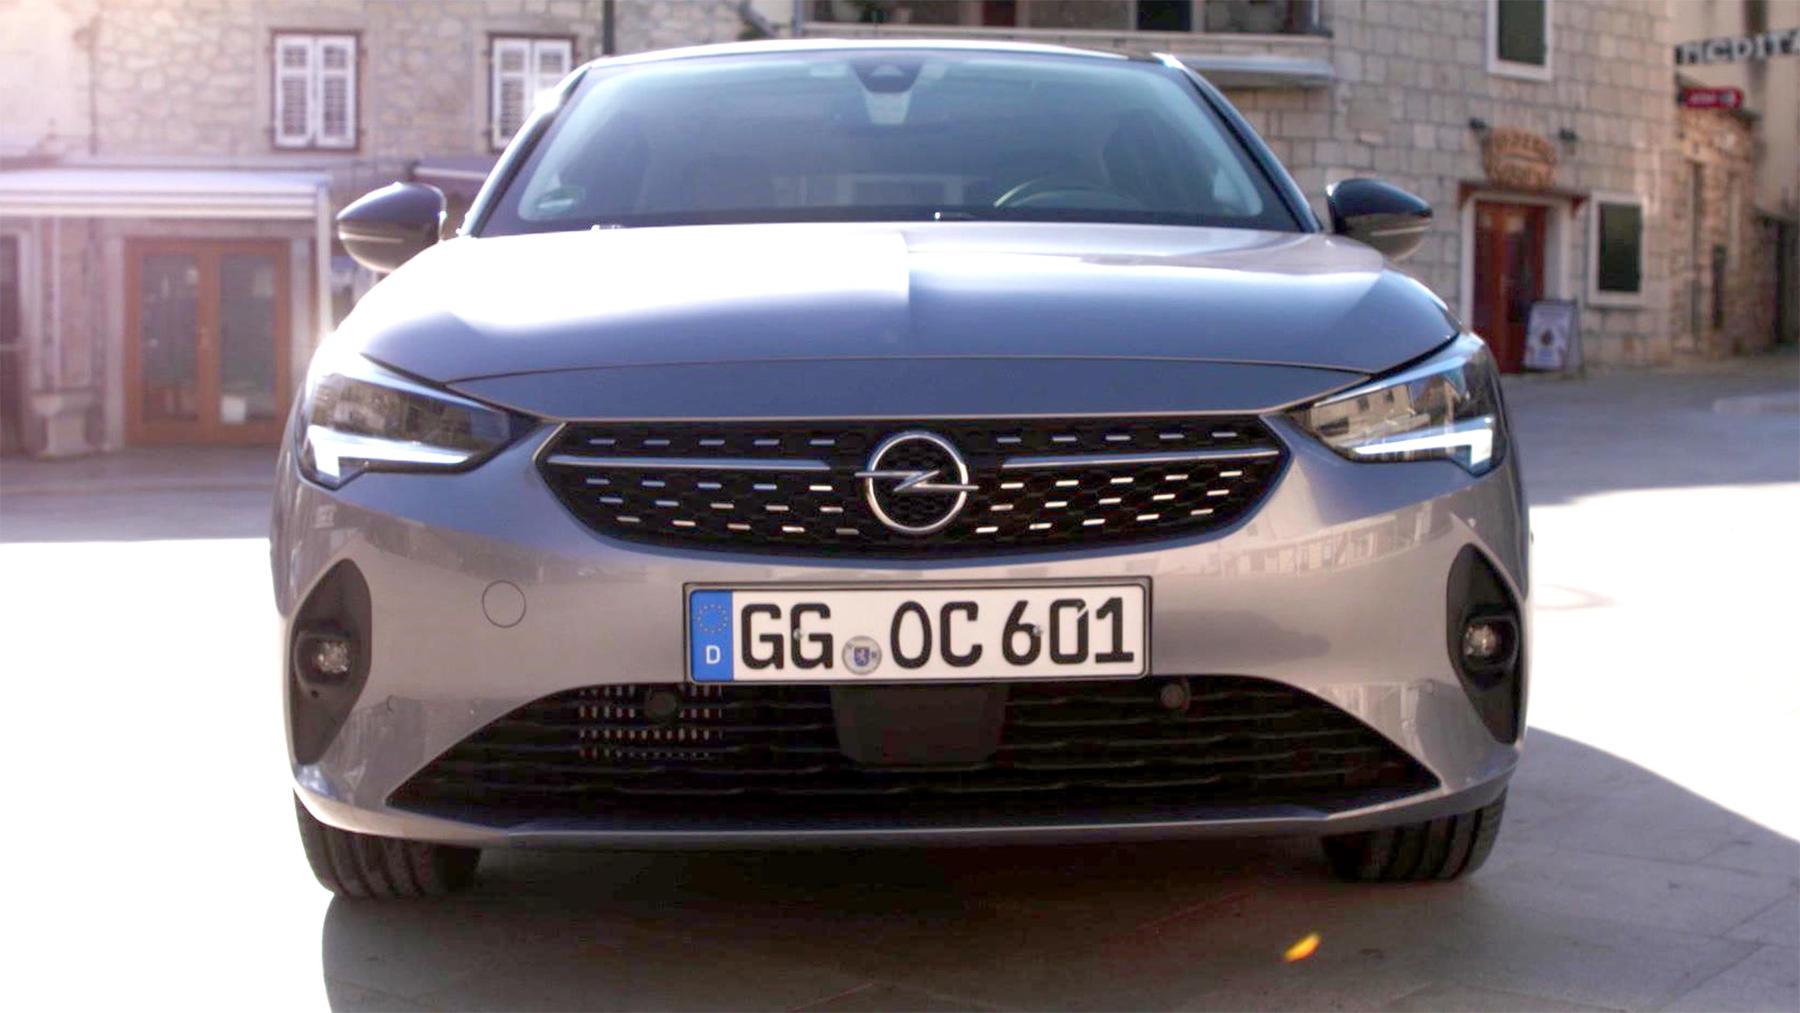 Thema heute u.a.: Fahrbericht Opel Corsa mit Andi